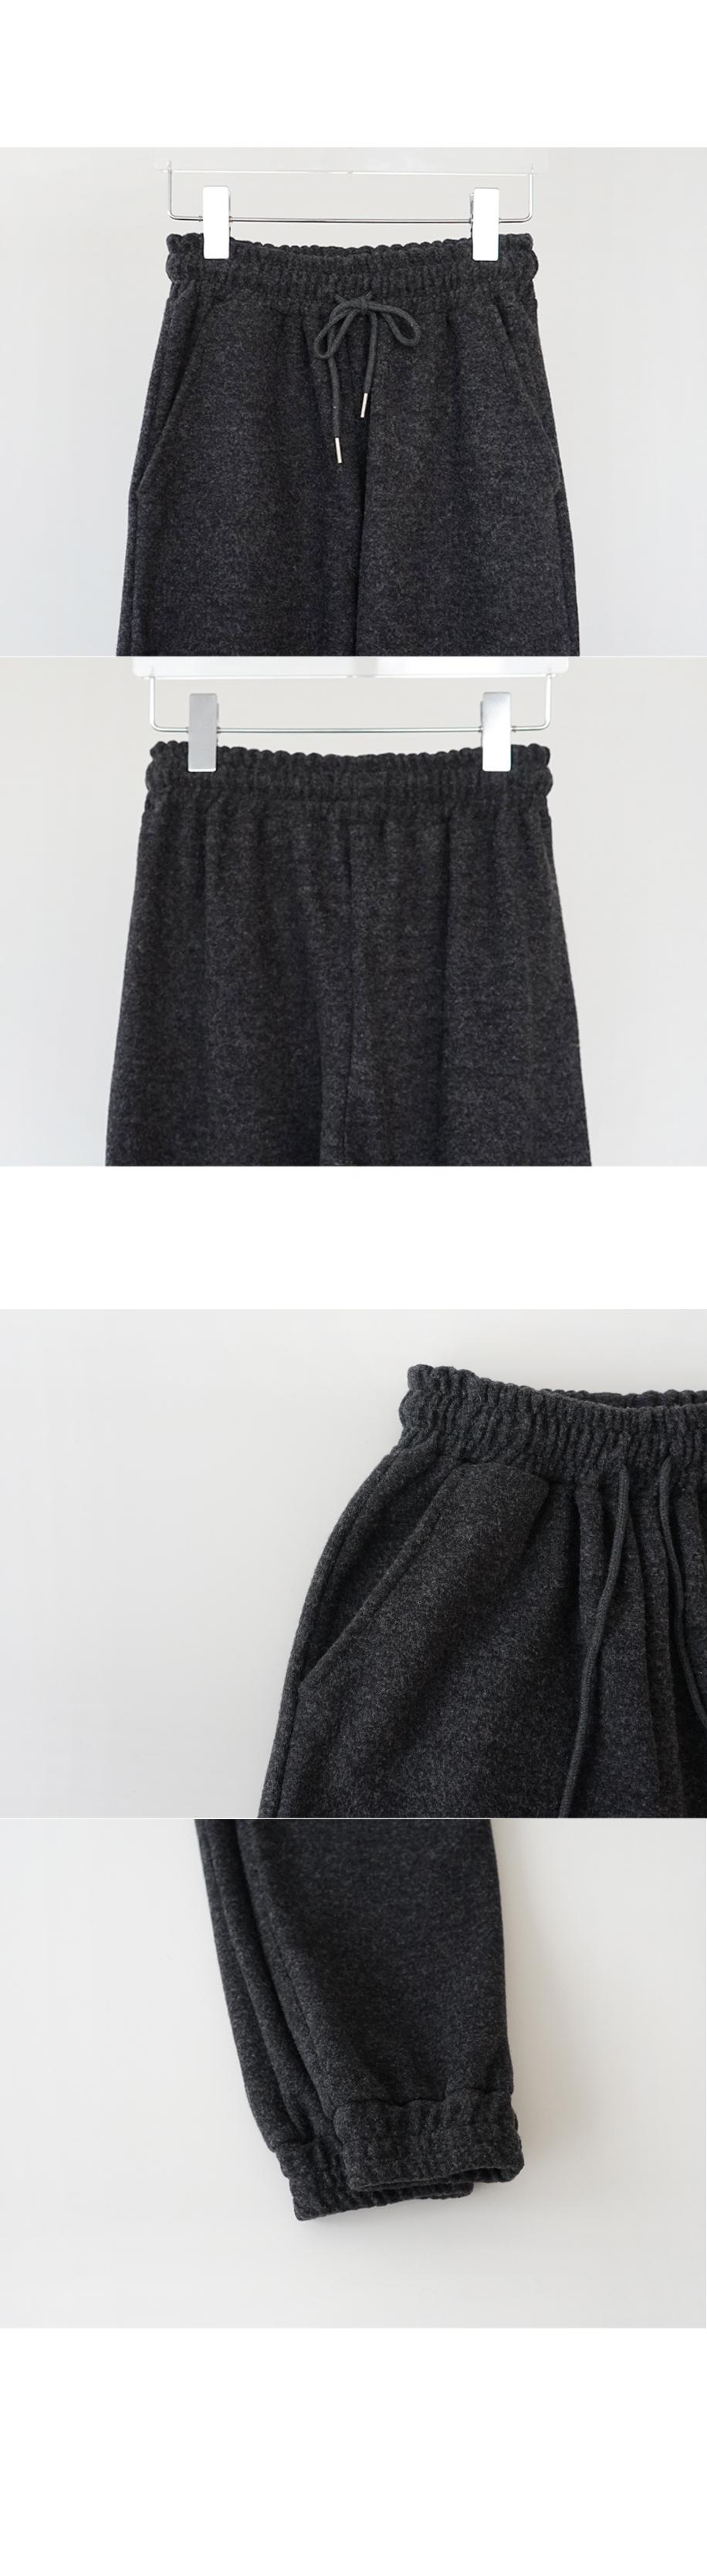 snug banding jogger pants (2colors)